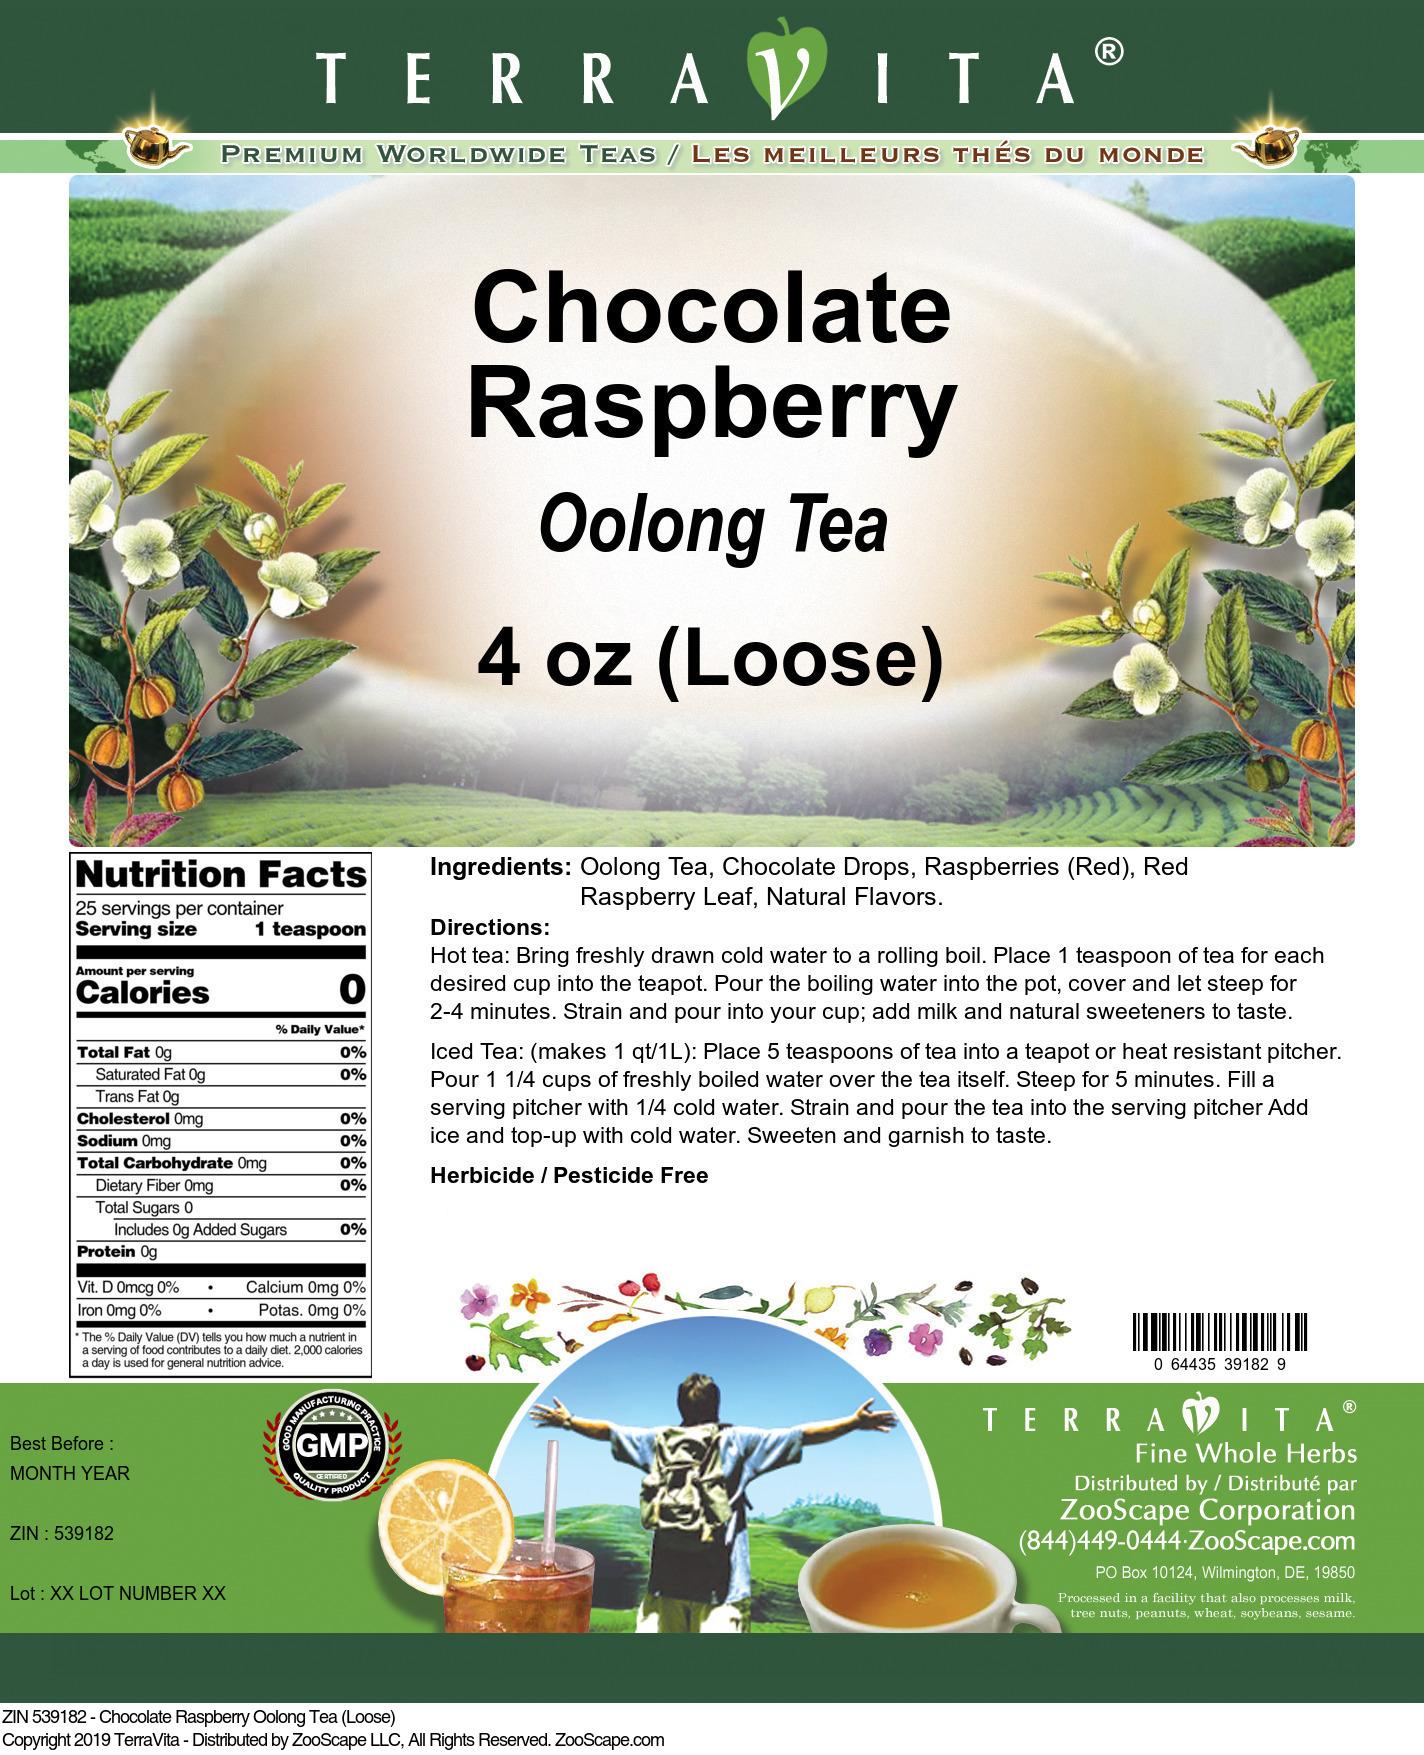 Chocolate Raspberry Oolong Tea (Loose)